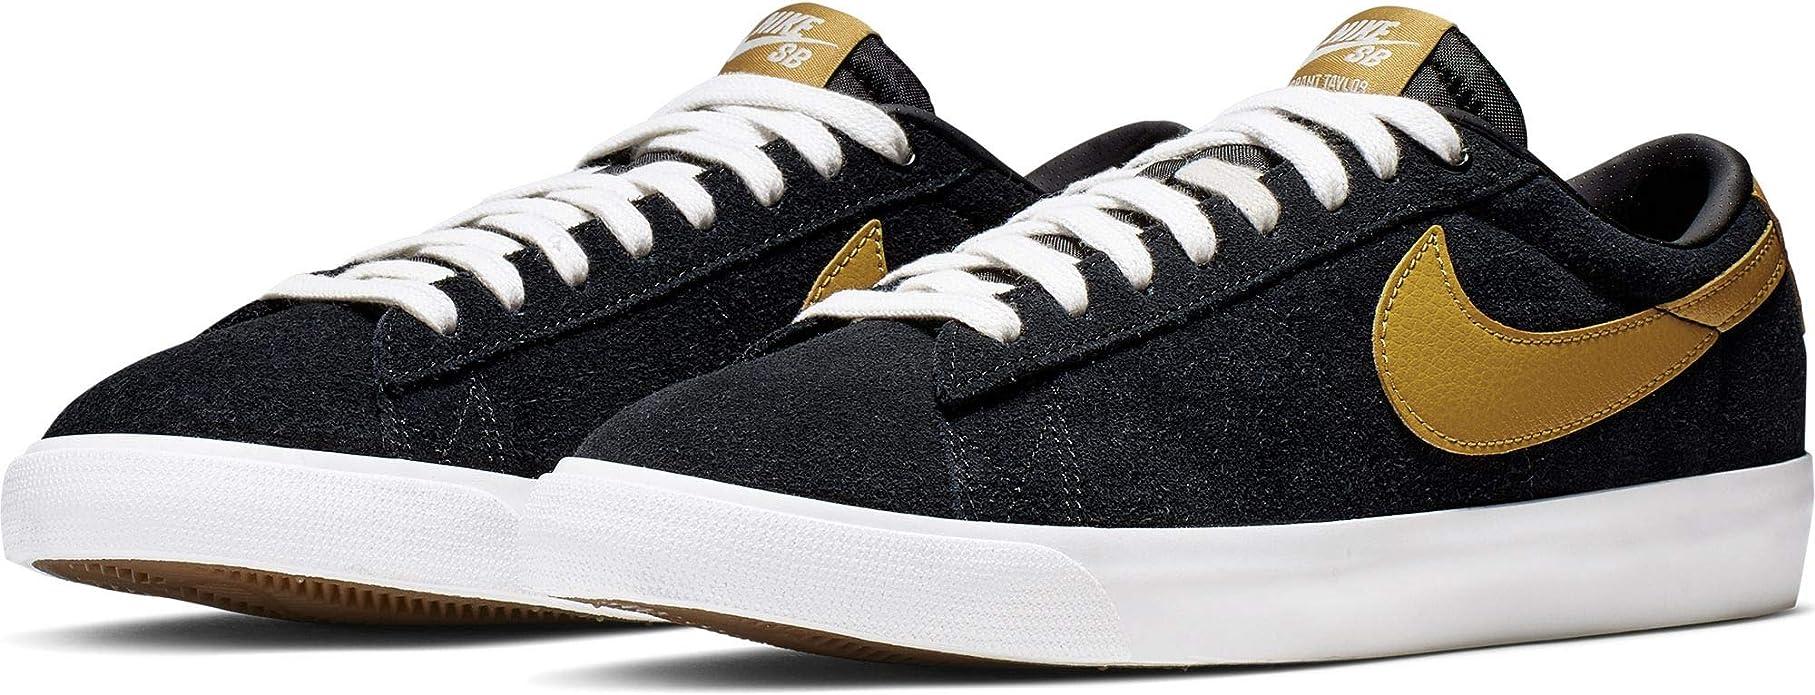 Nike SB Blazer Low GT Black/Wheat